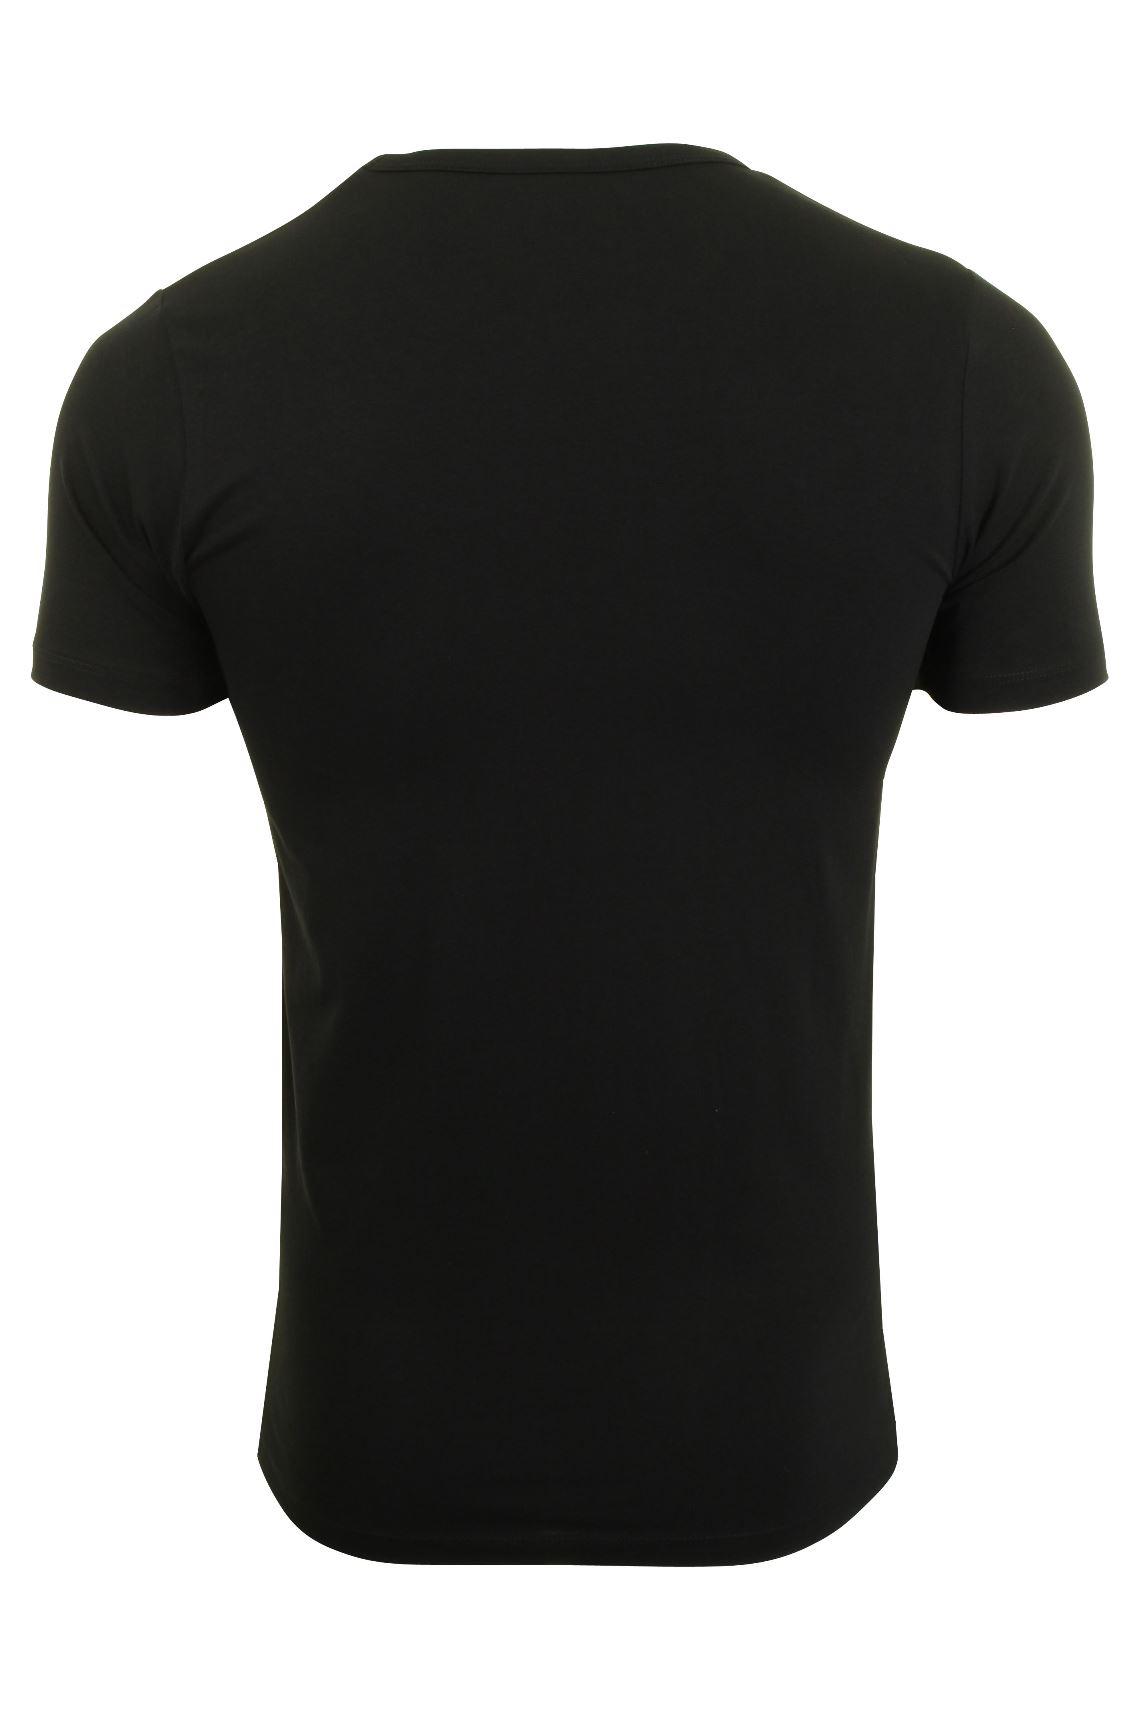 Jack-amp-Jones-De-Hombre-S-S-Cuello-Redondo-Camiseta-Slim-Fit miniatura 4